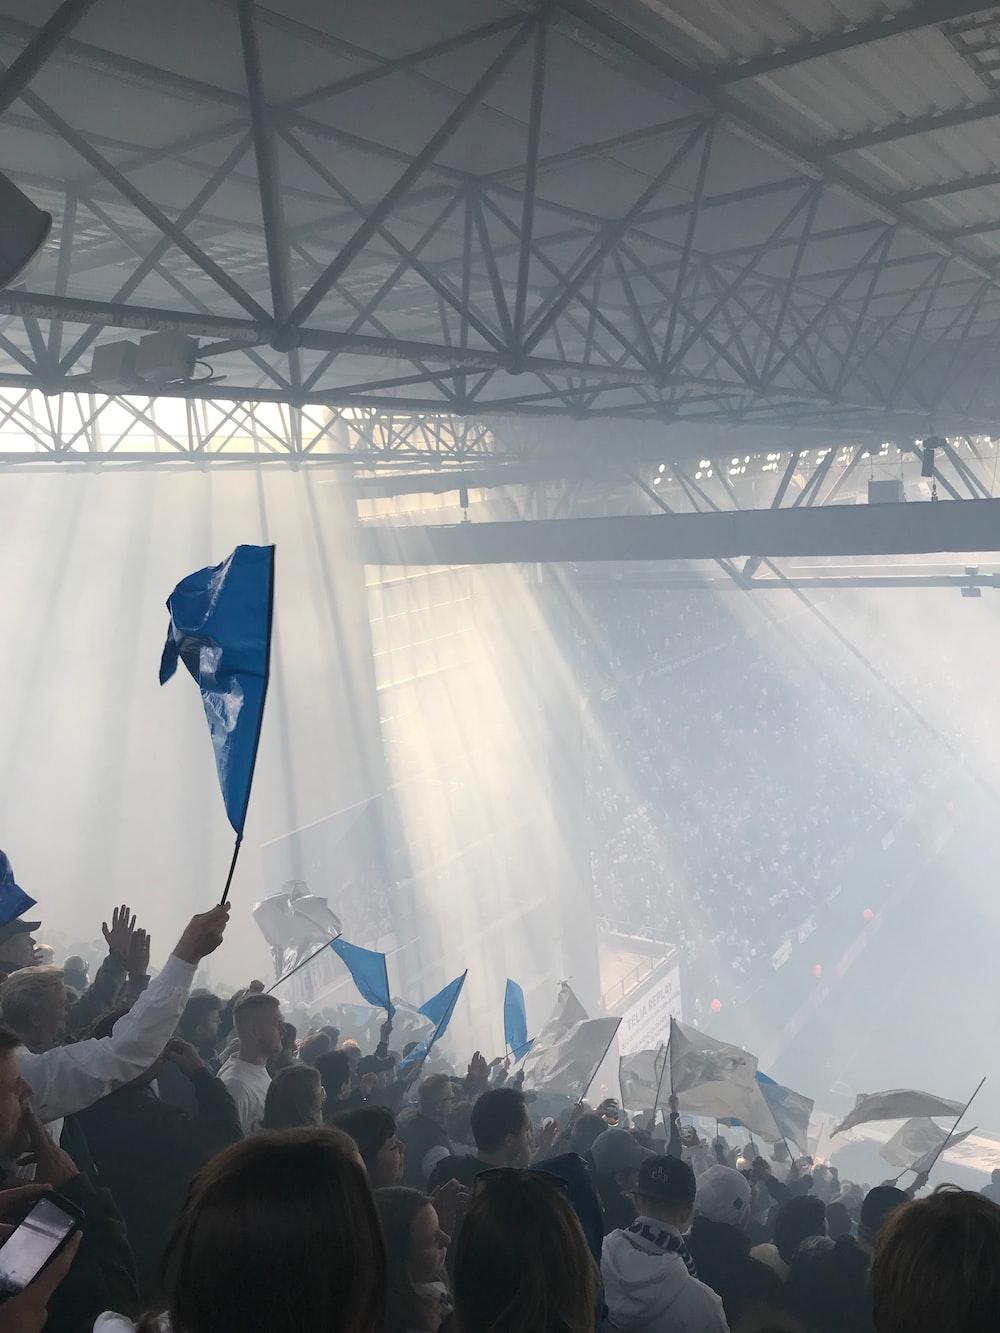 man waving the blue flag